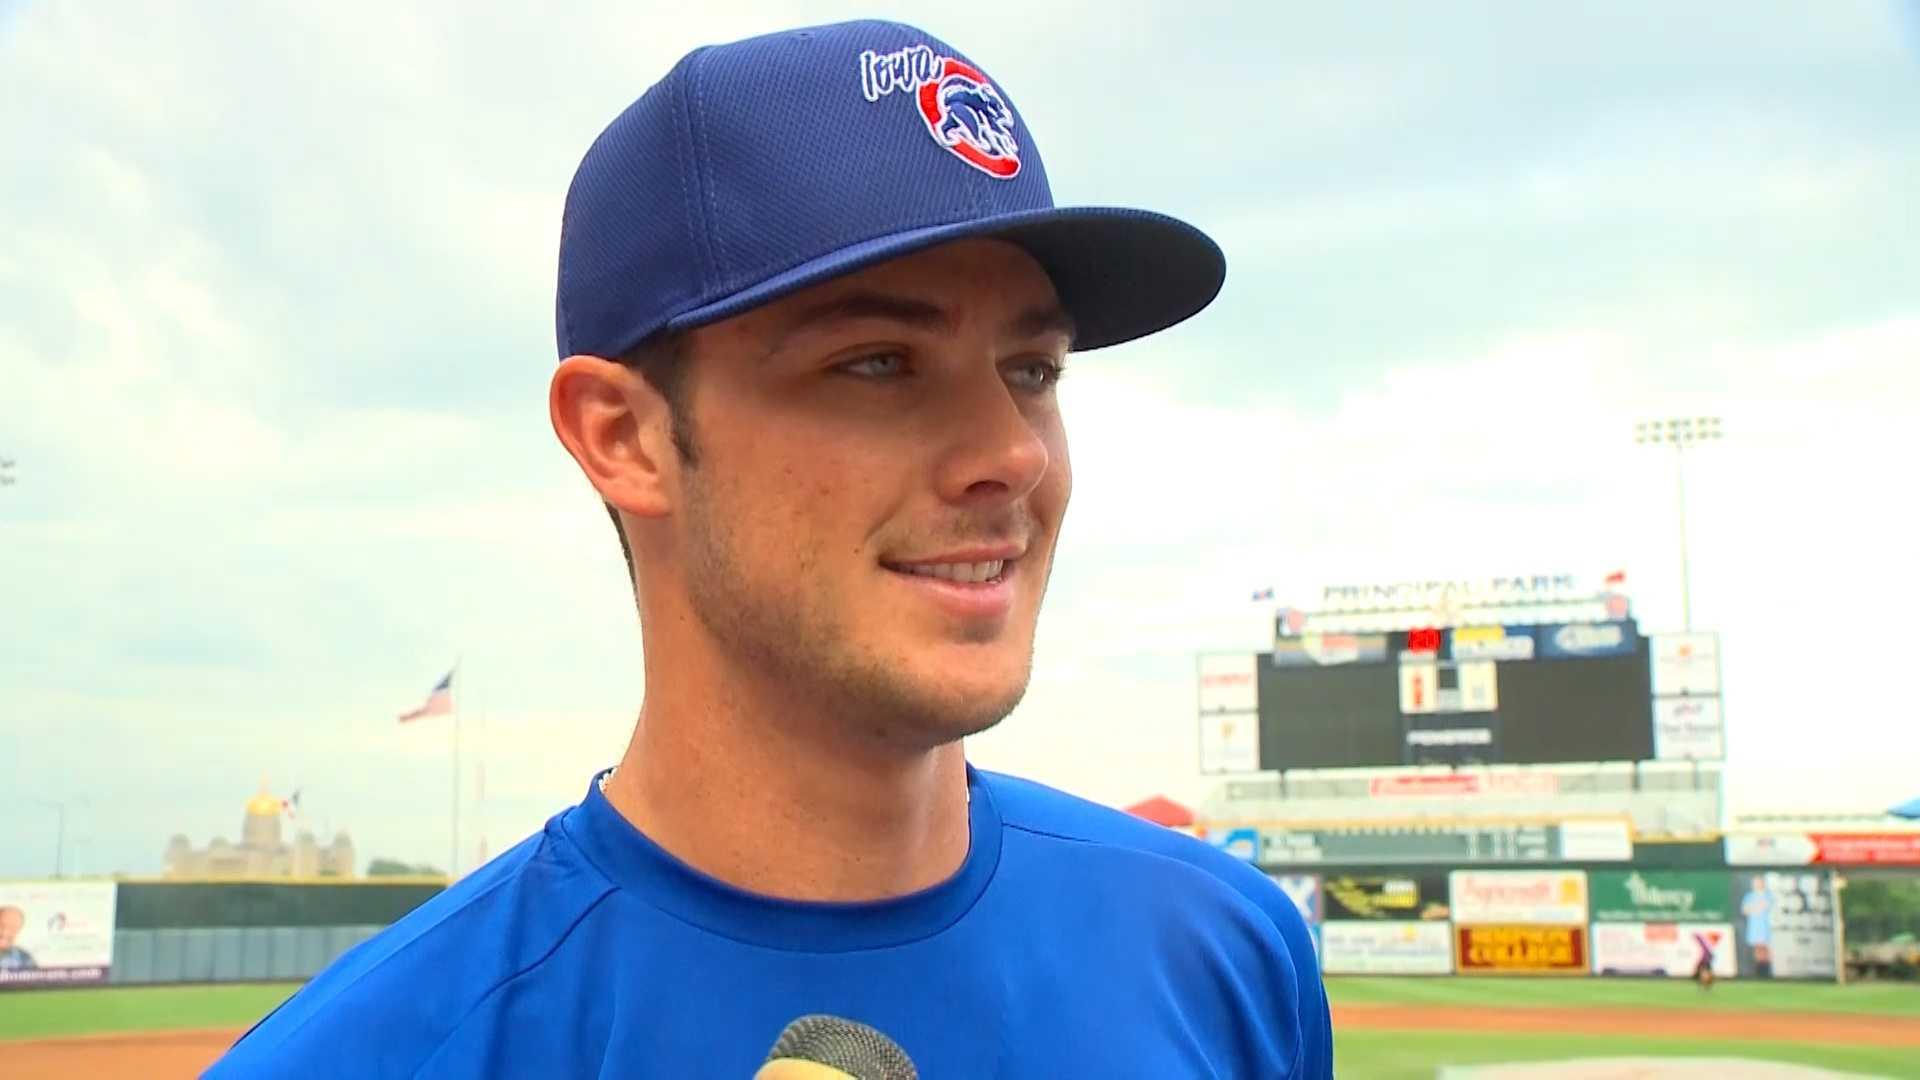 Iowa Cubs 3rd baseman Kris Bryant